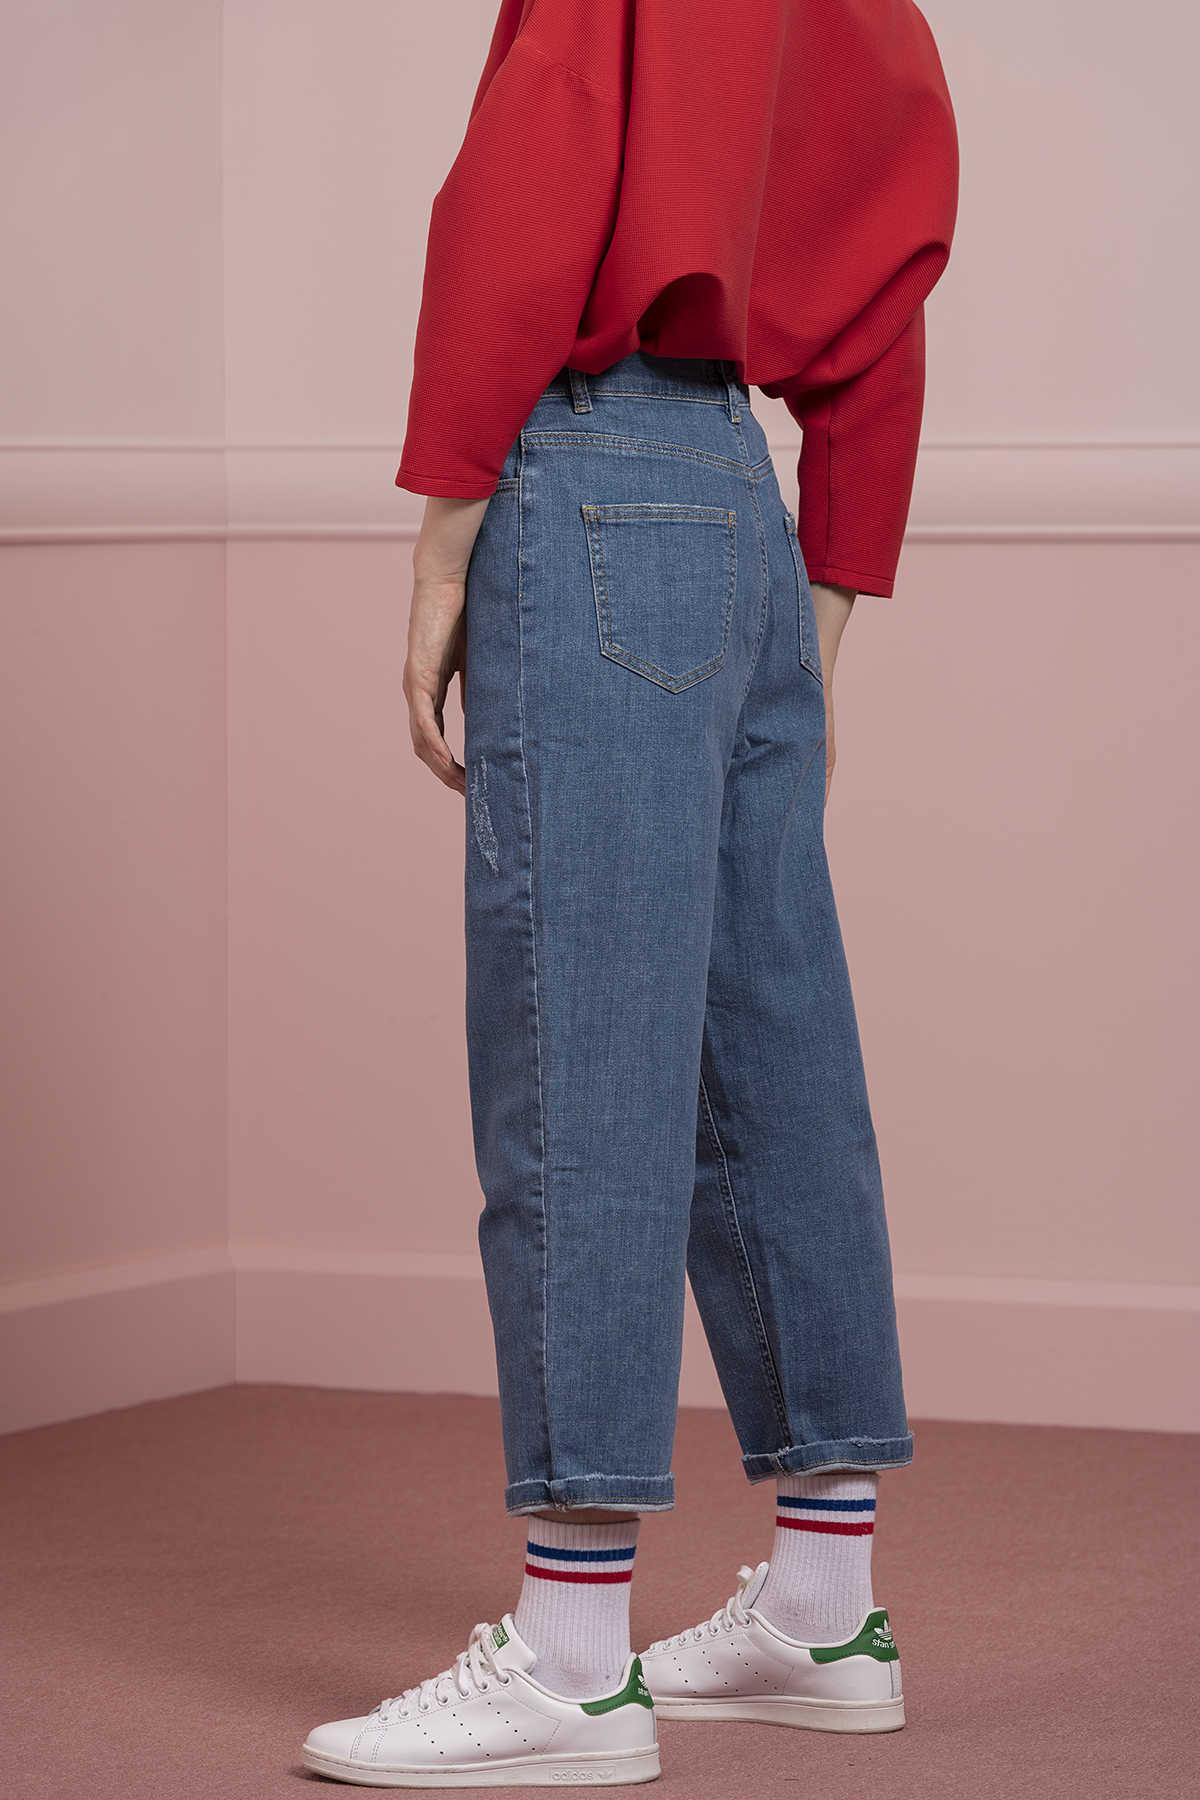 Kuaybe Gider - D4009 Pantolon